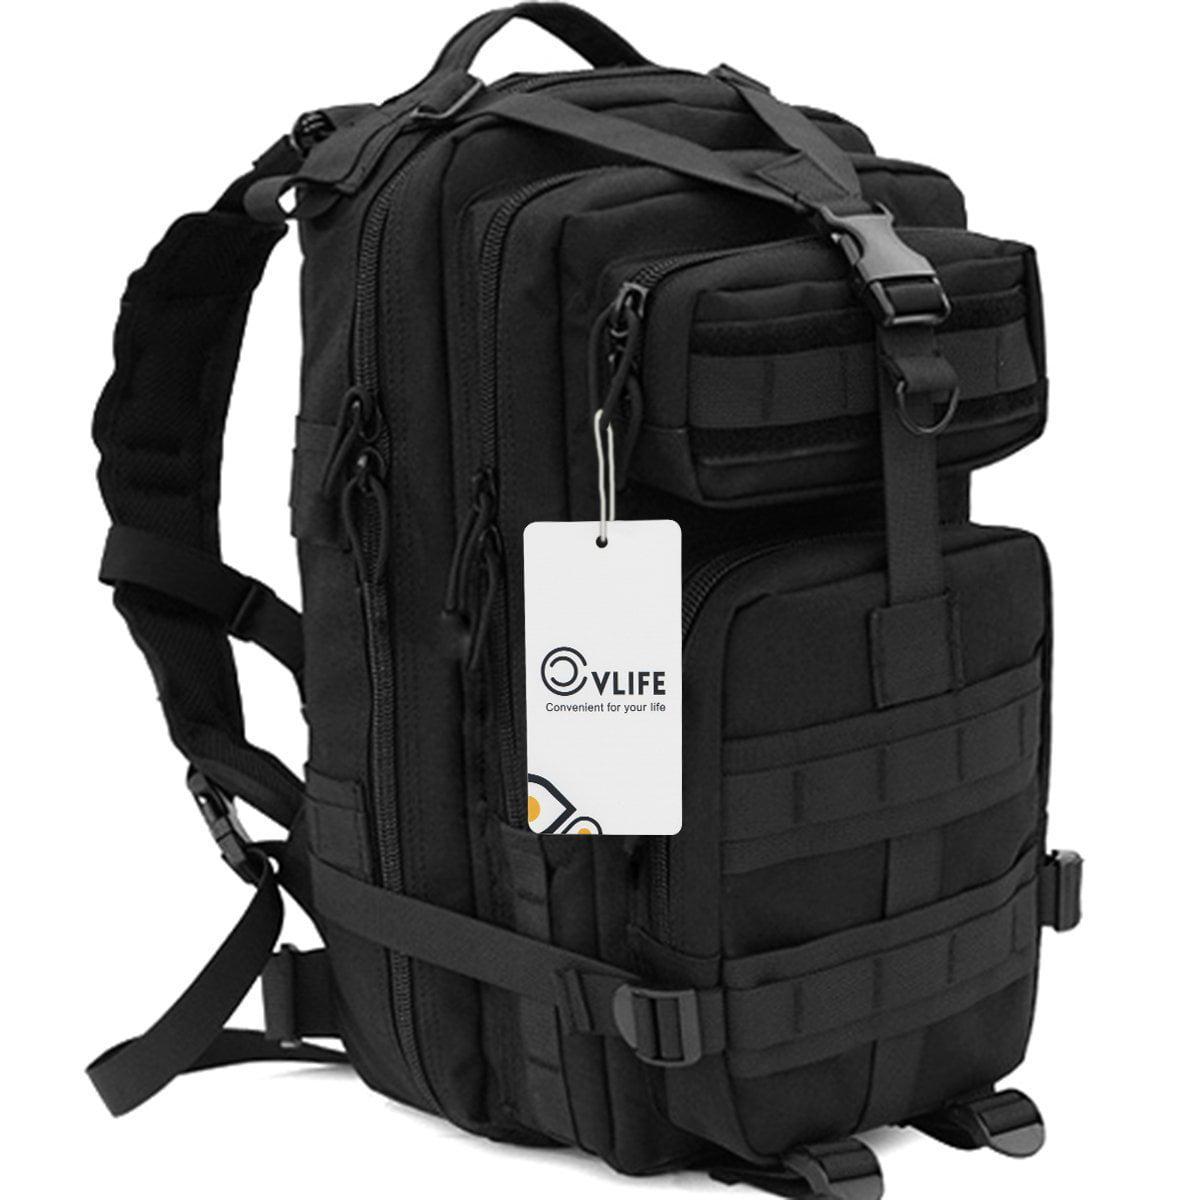 CVLIFE Outdoor Tactical Backpack Military Rucksacks for Camping Hiking and Trekking Waterproof 30L (Black)